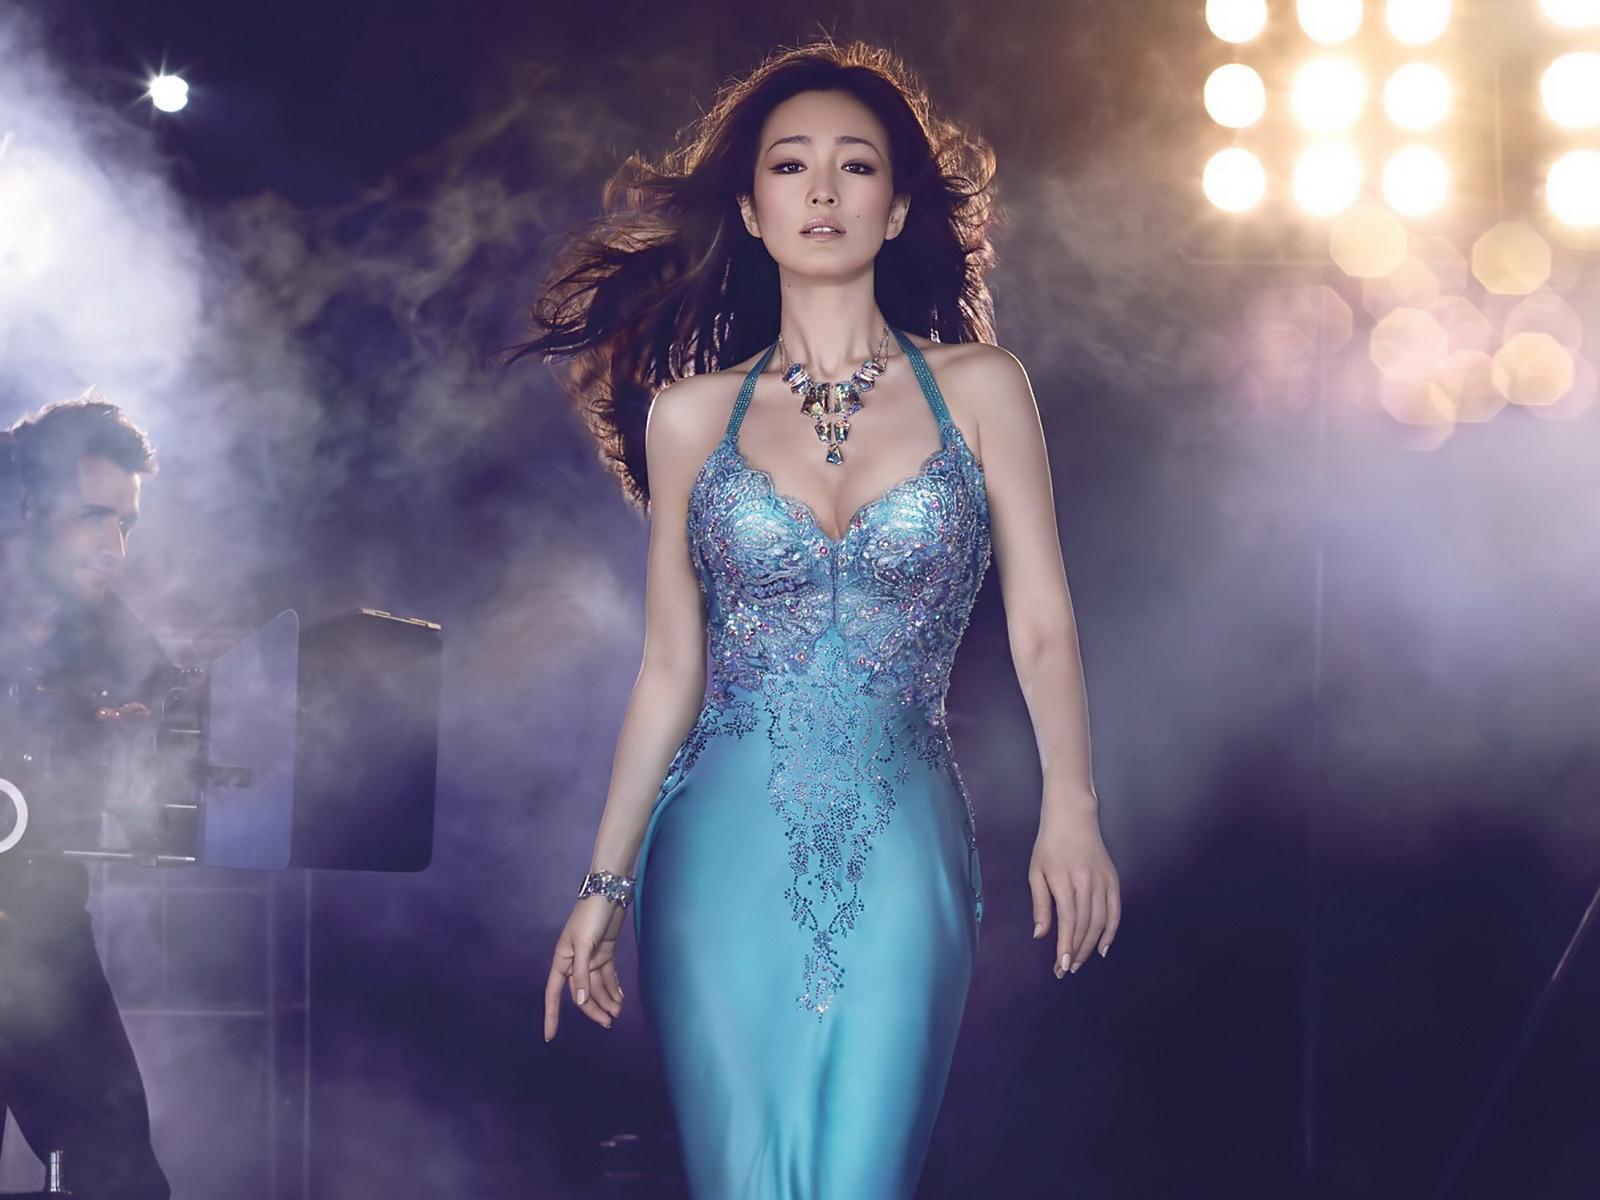 Gong Li Nude Video